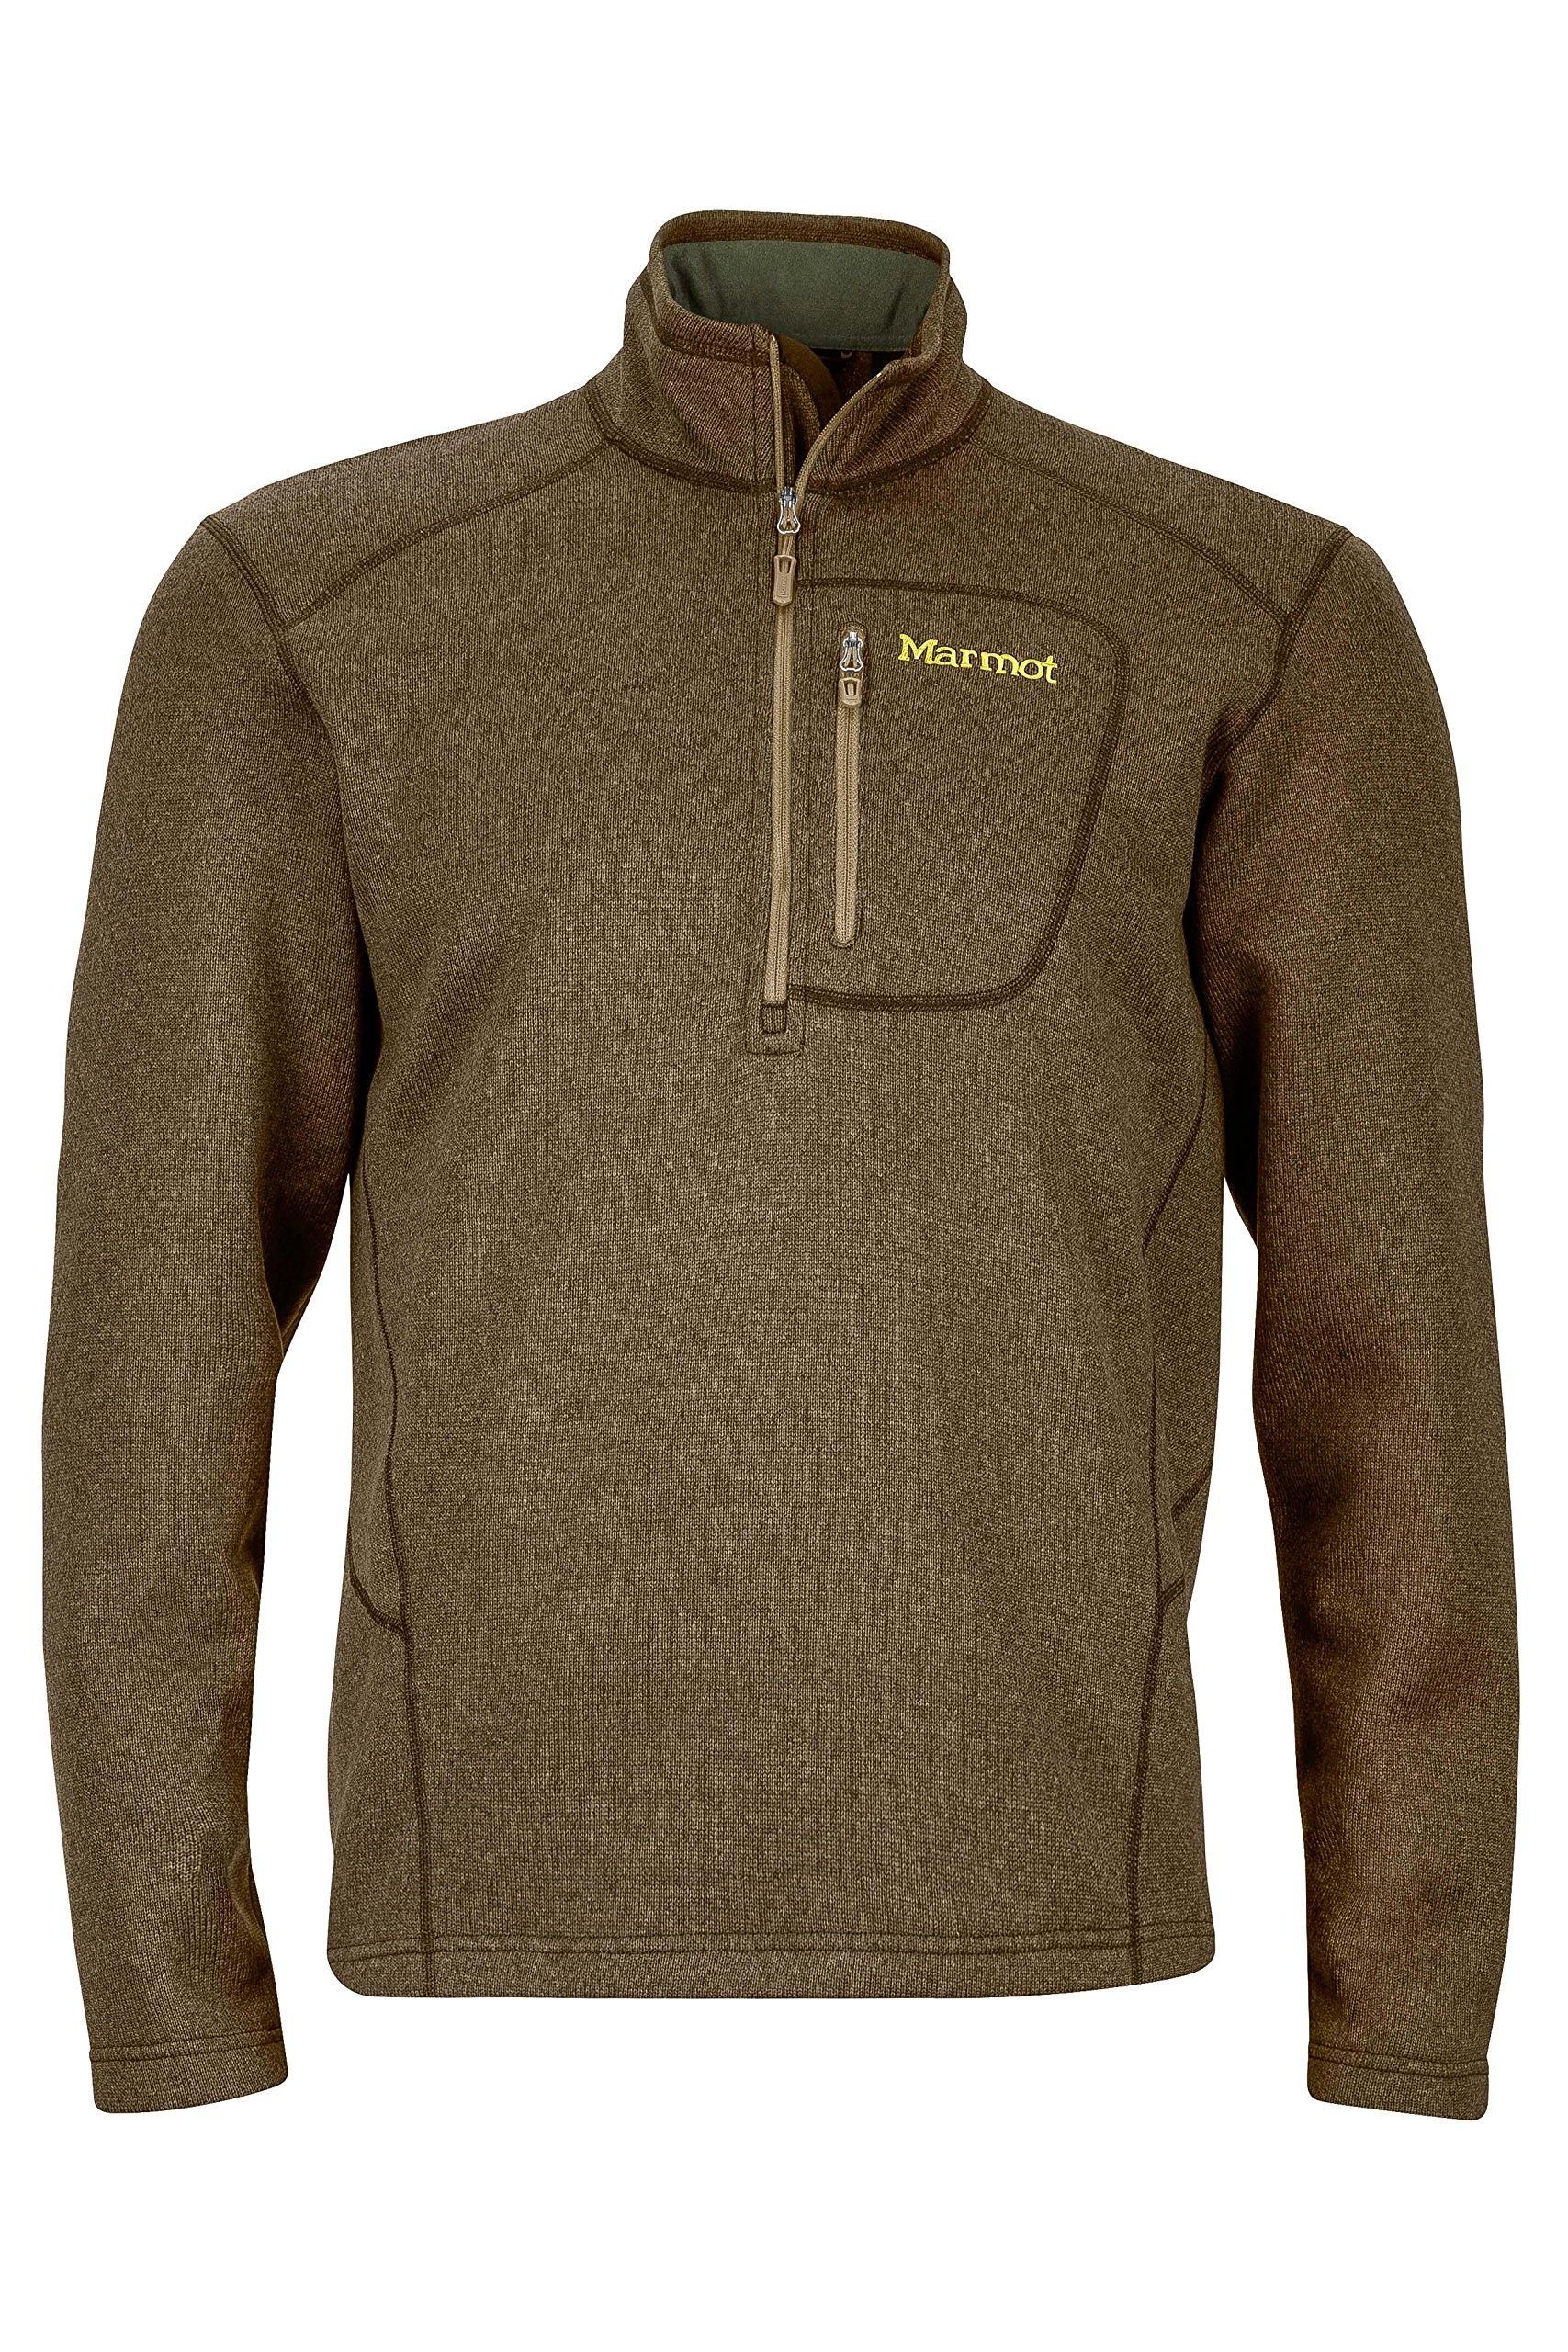 Marmot Drop Line 1/2 Zip Men's Pullover Jacket, Lightweight 100-Weight Sweater Fleece, Deep Moss by Marmot